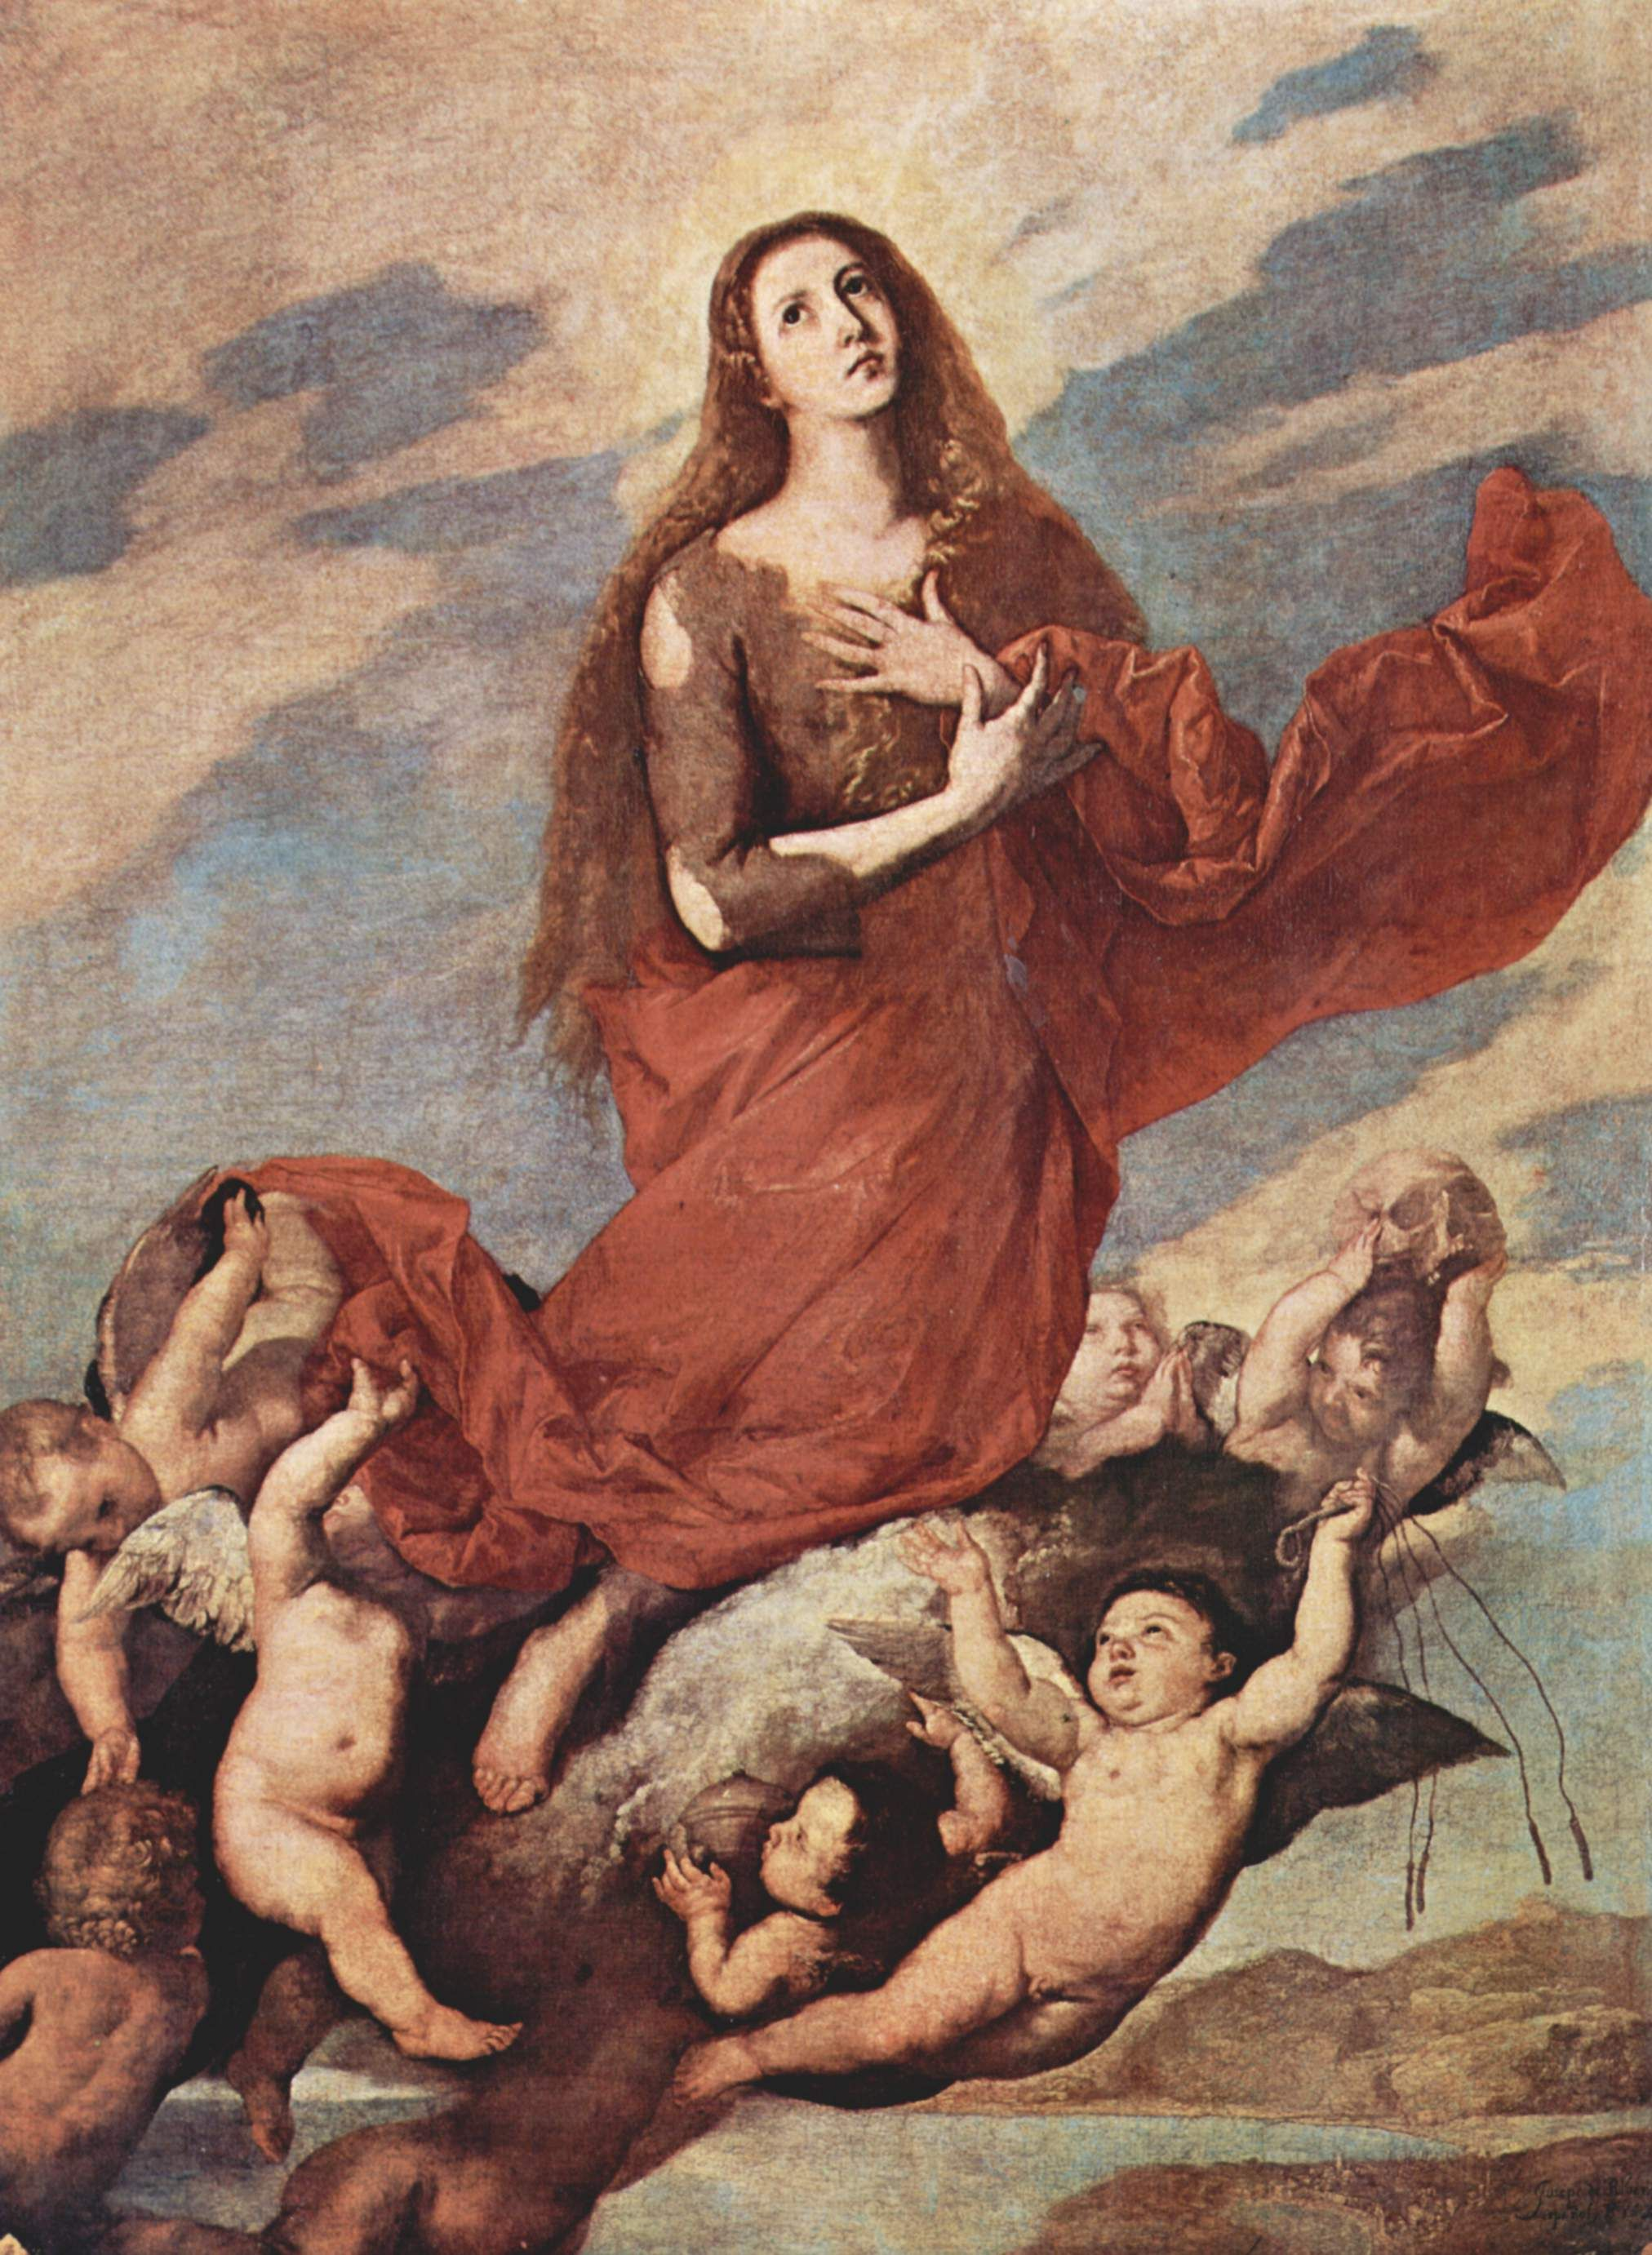 The Assumption of Mary Magdalene - Jusepe de Ribera